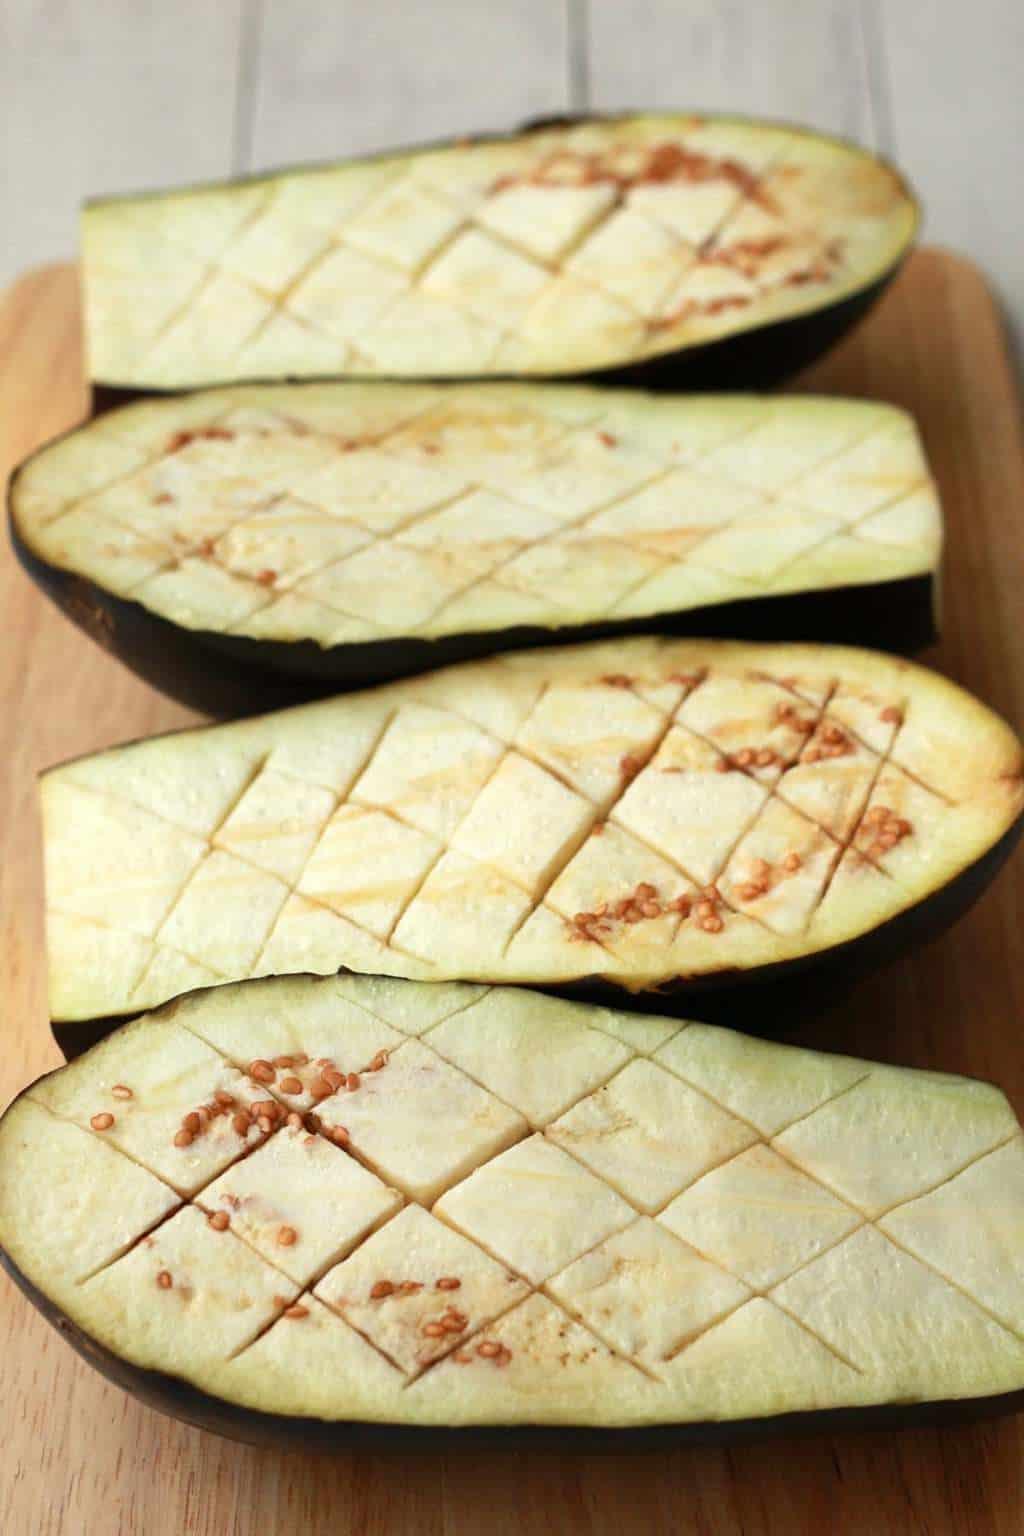 Rosemary and Olive Oil Roasted Eggplant #vegan #lovingitvegan #appetizer #sides #eggplant #glutenfree